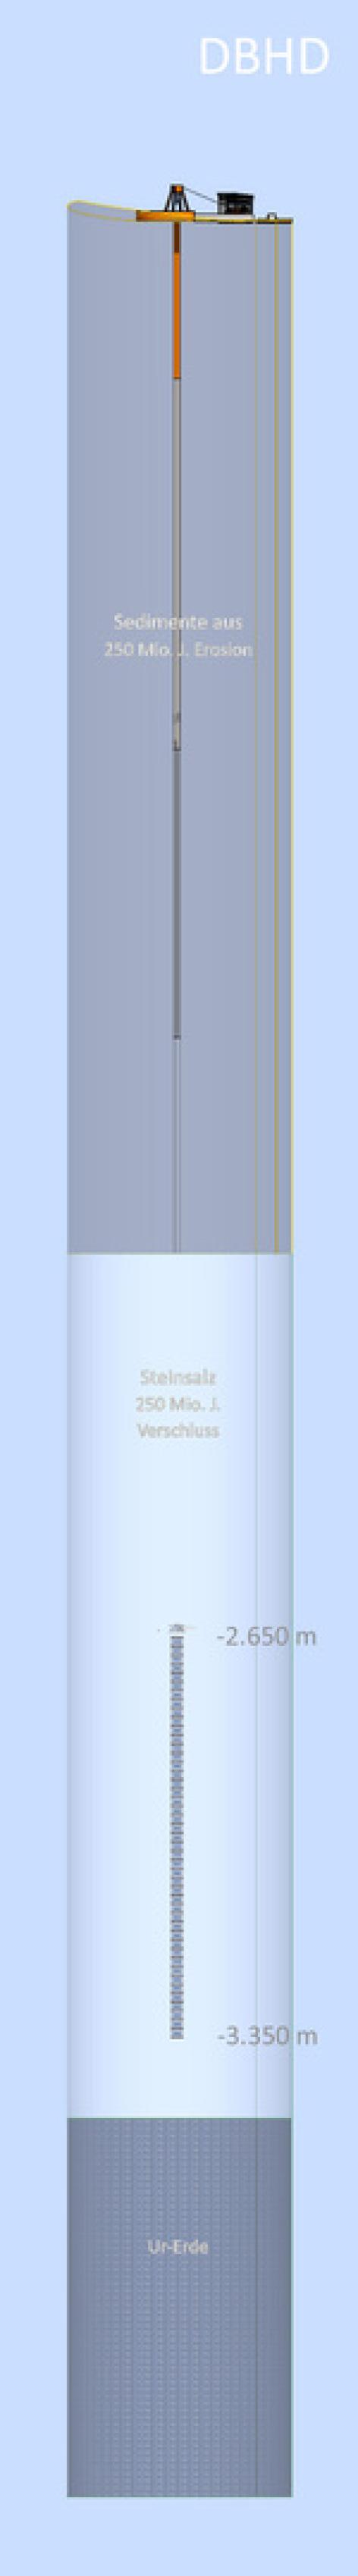 Schichtung Atommuell GTKW Kröpelin Deep Borehole Disposal Germany